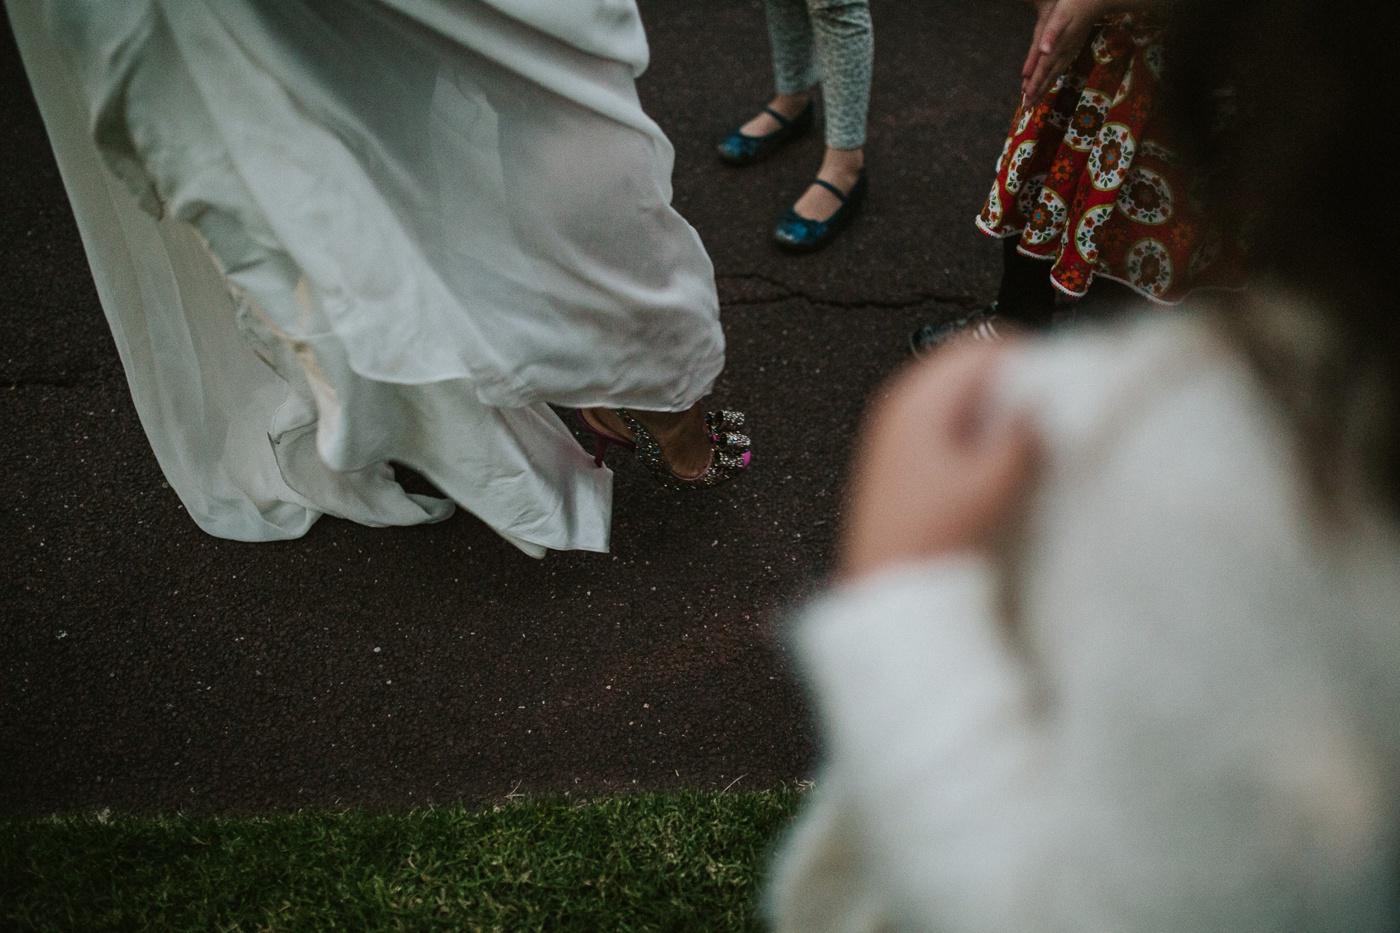 anitadaniel_melbourne-scienceworks-relaxed-fun-geek-wedding_melbourne-candid-wedding-photography_55